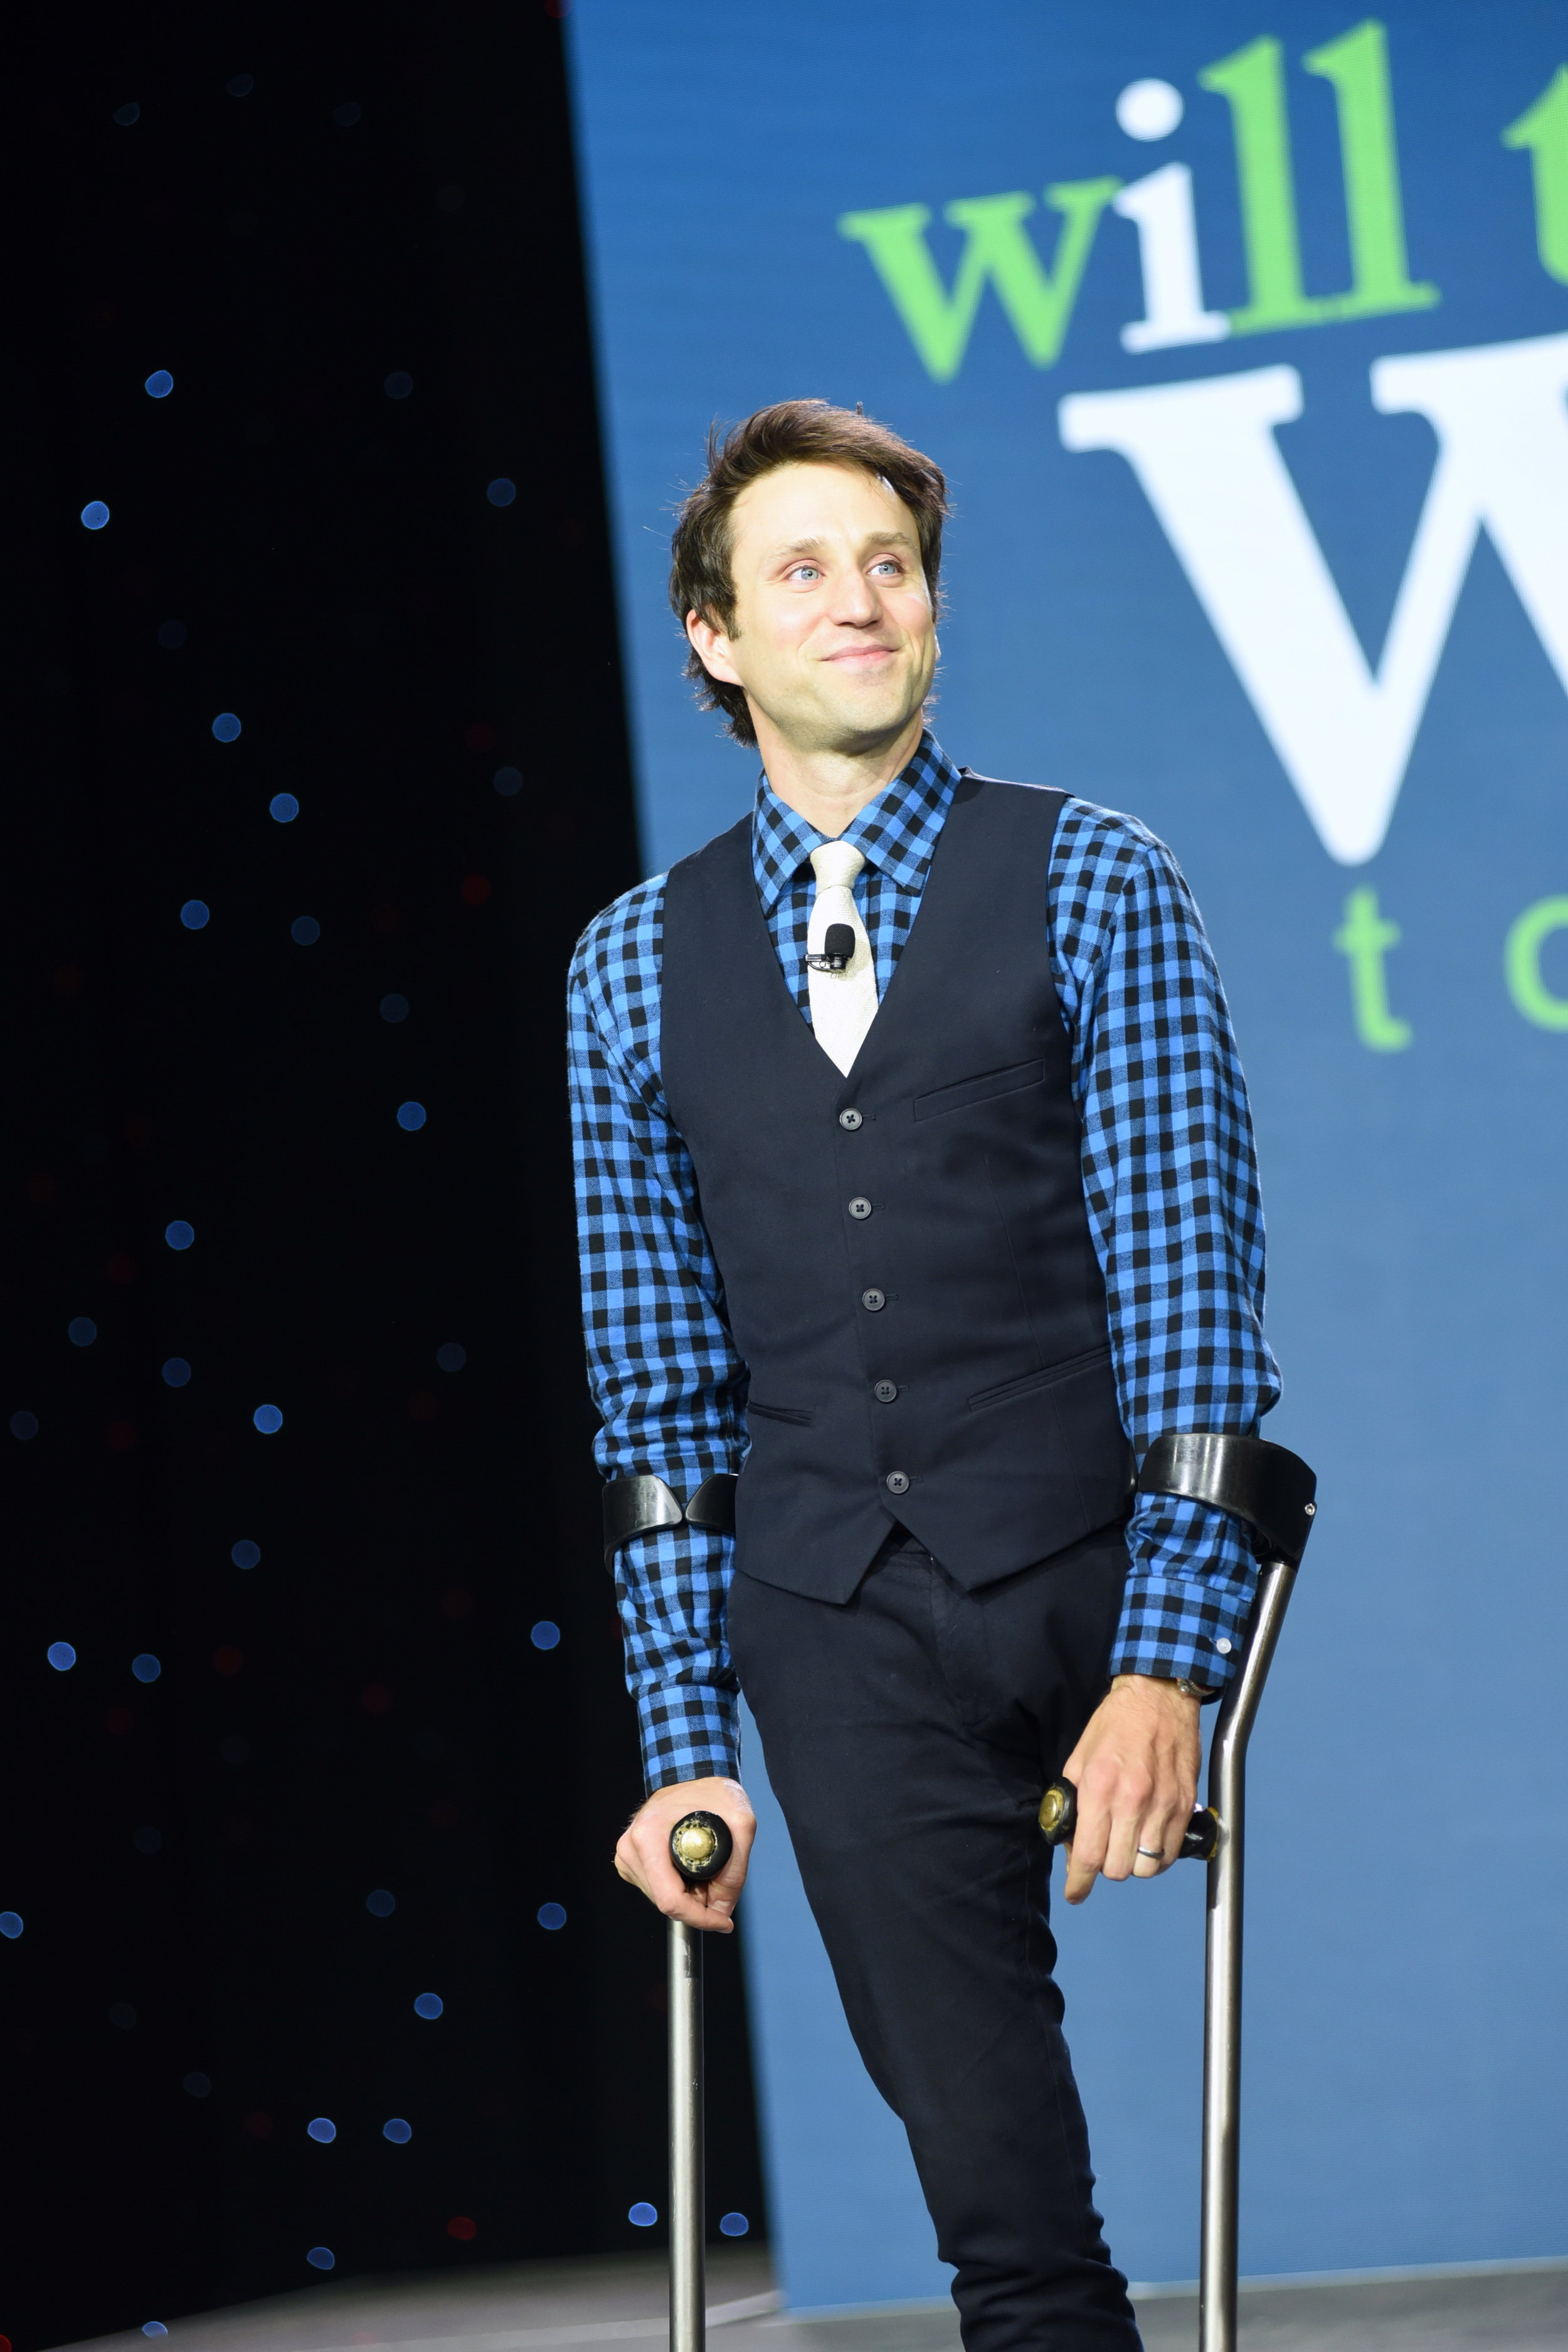 Josh Sundquist smiles while giving a motivational speech